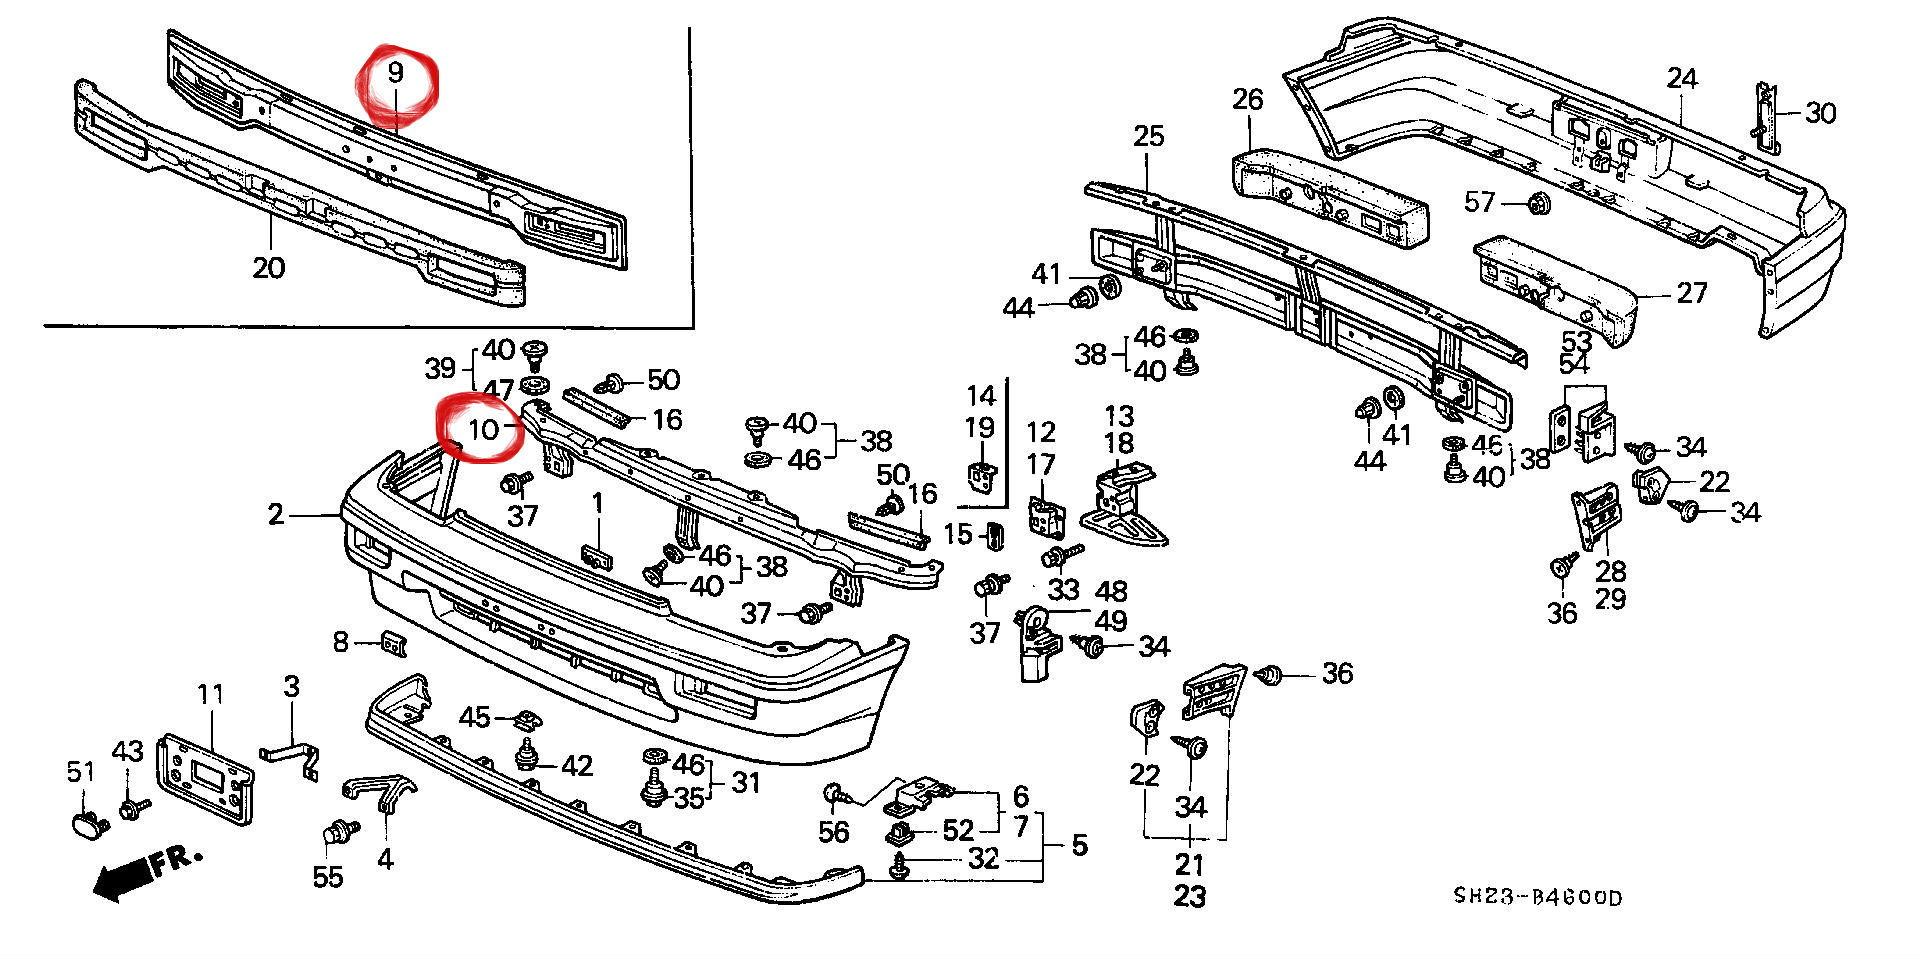 90 Honda Civic Wiring Diagram